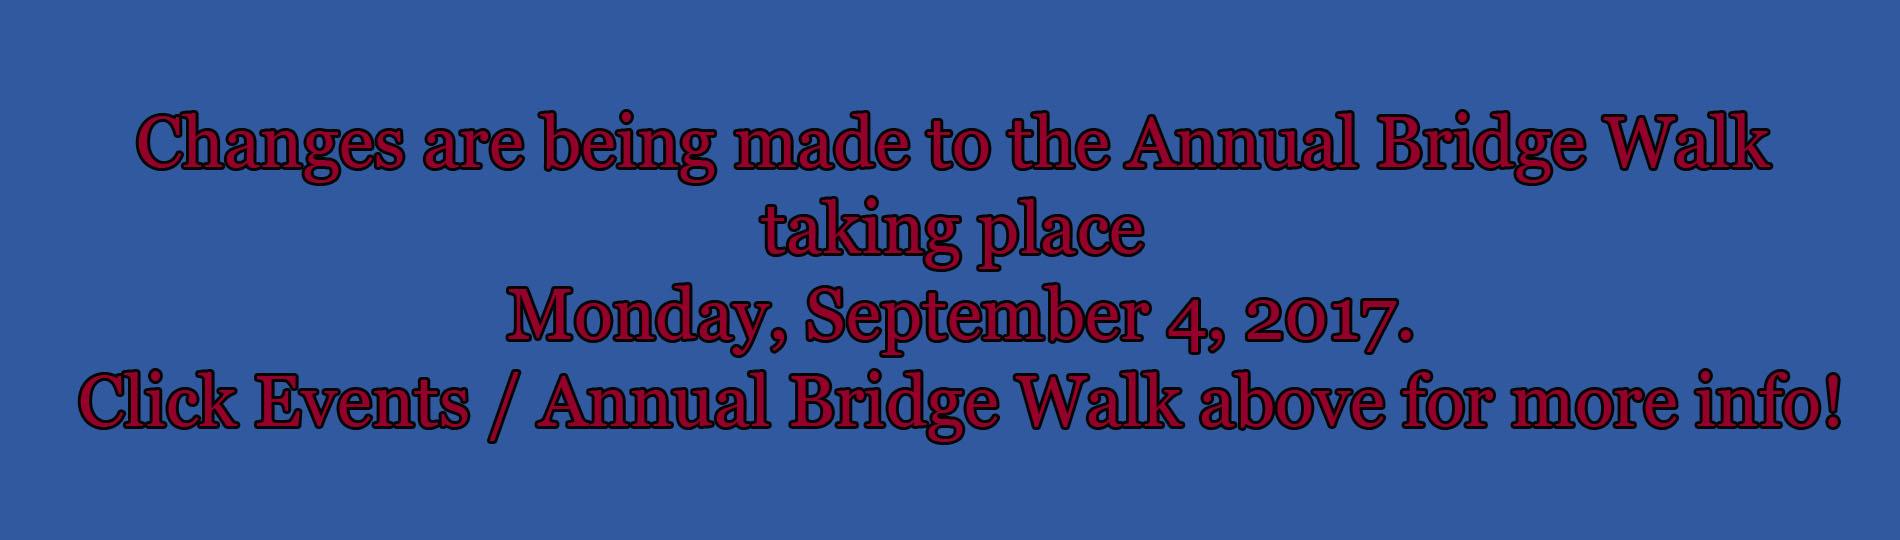 Bridge Walk Closure Banner